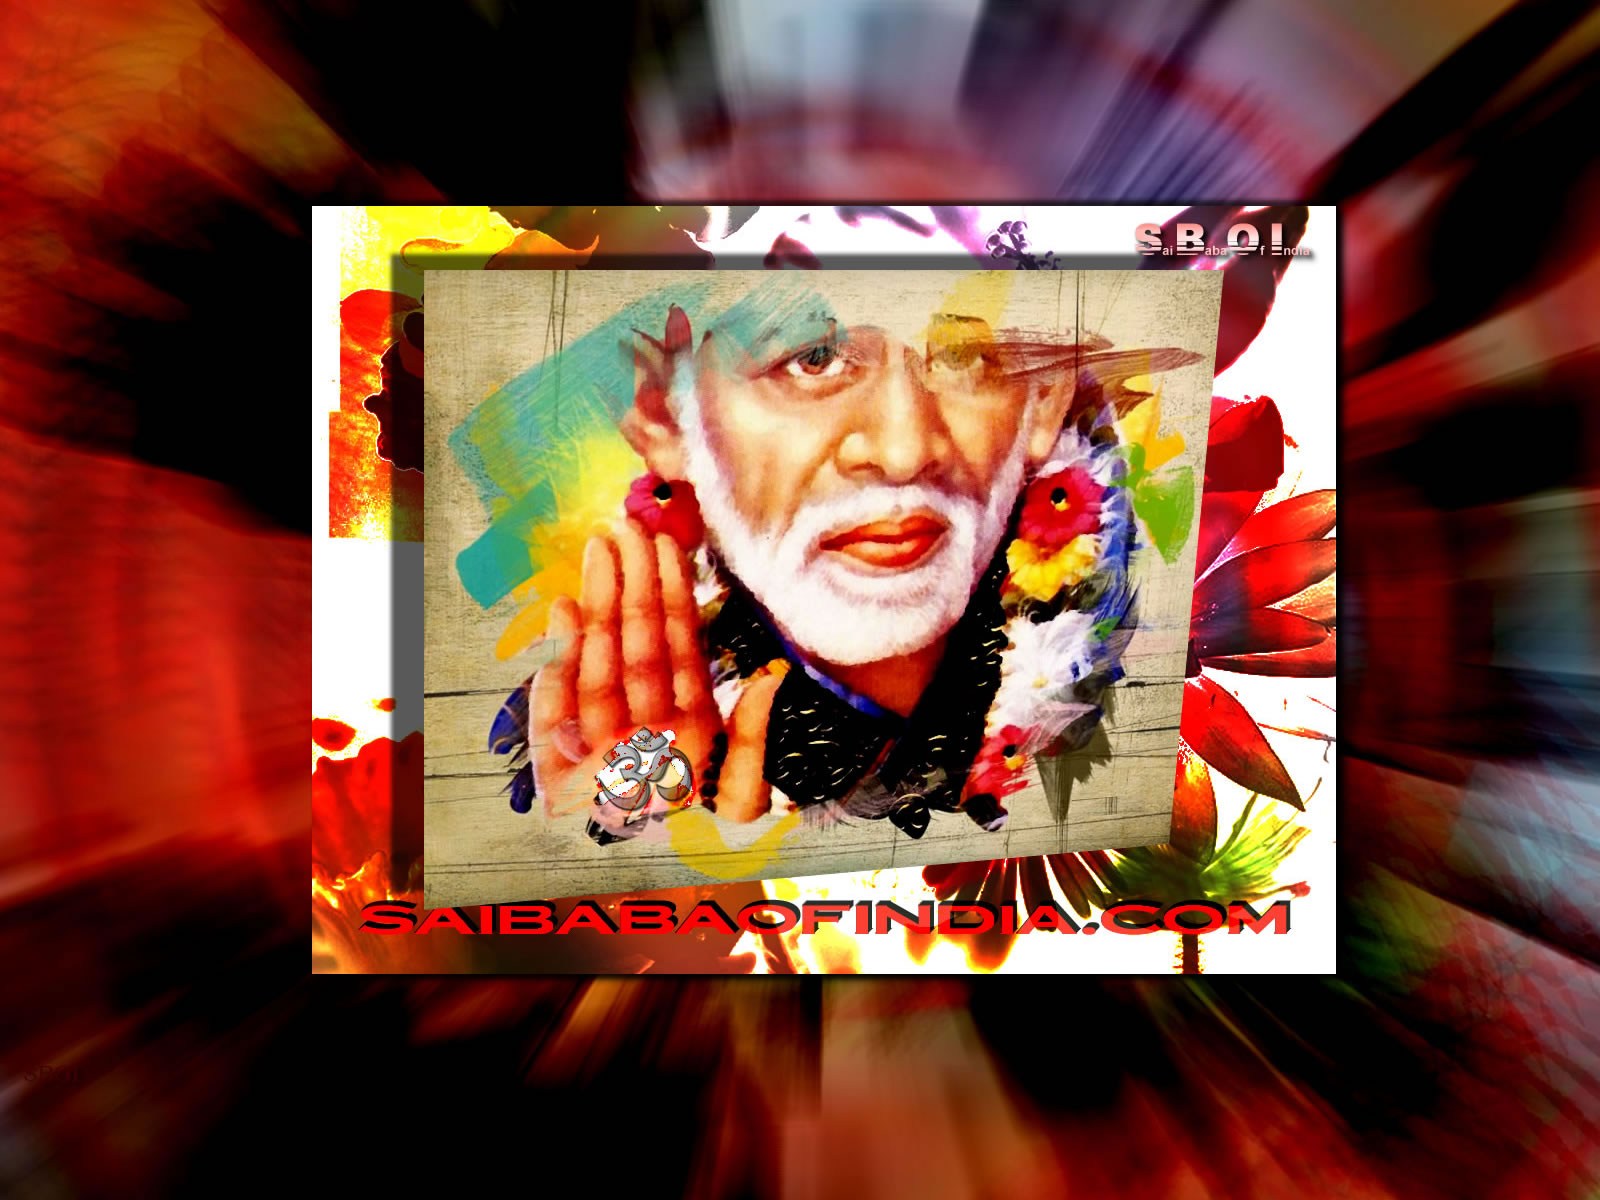 Sai Baba Wallpapers Photos Free Download Desktop Backgrounds